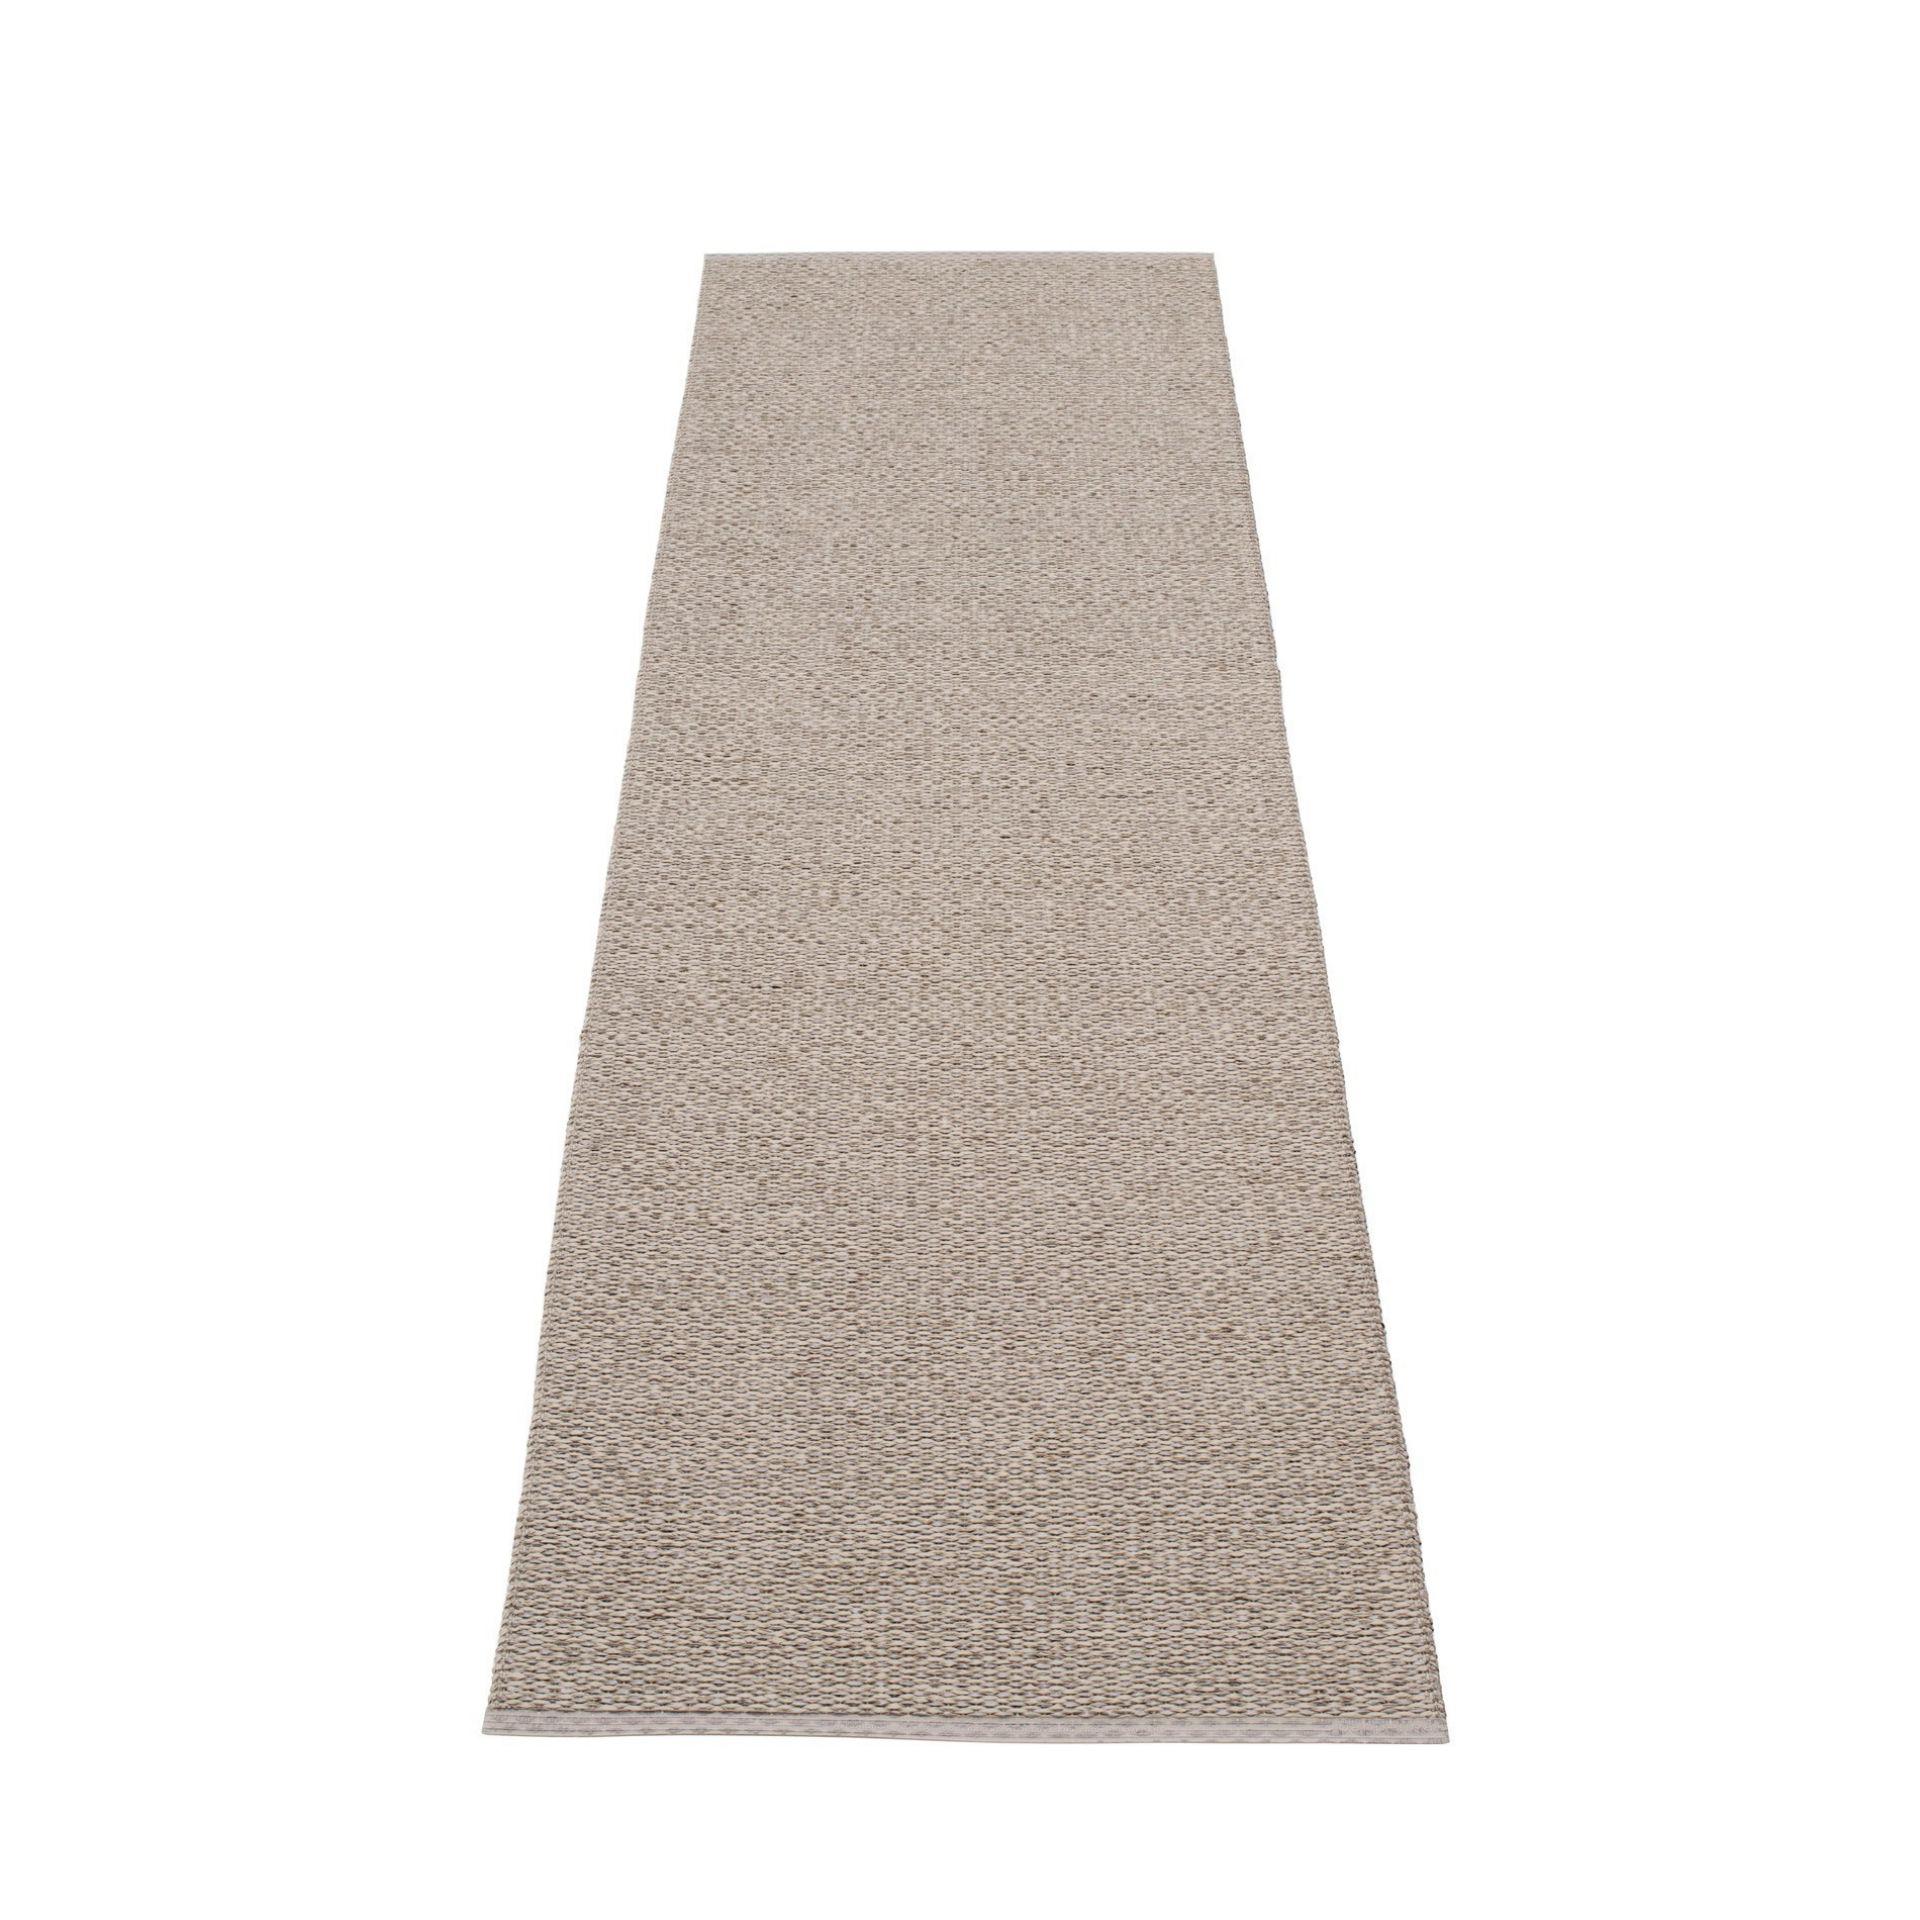 Svea Kunststoffteppich 70x240 cm Pappelina Schlamm